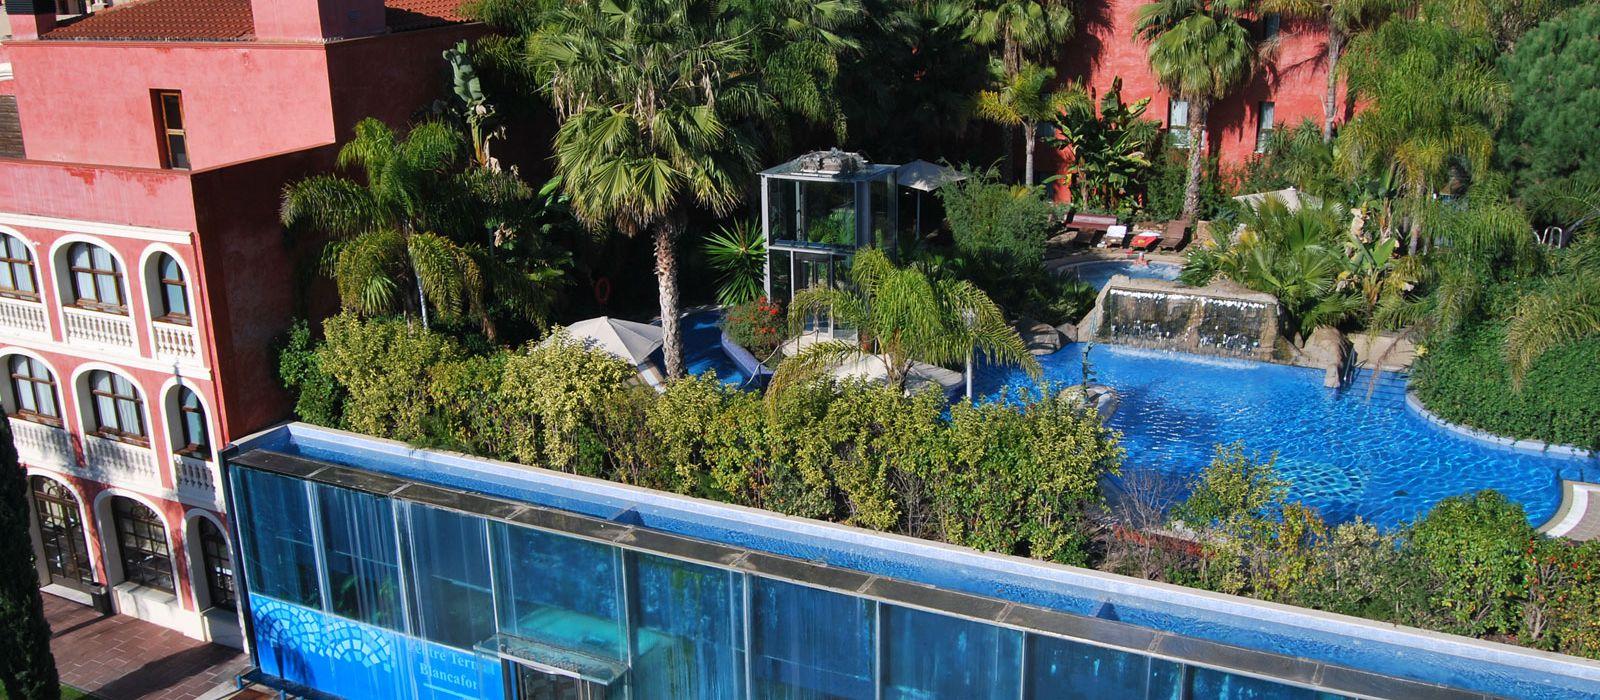 Oтельl Spa Termal La Garriga | Hotel Blancafort